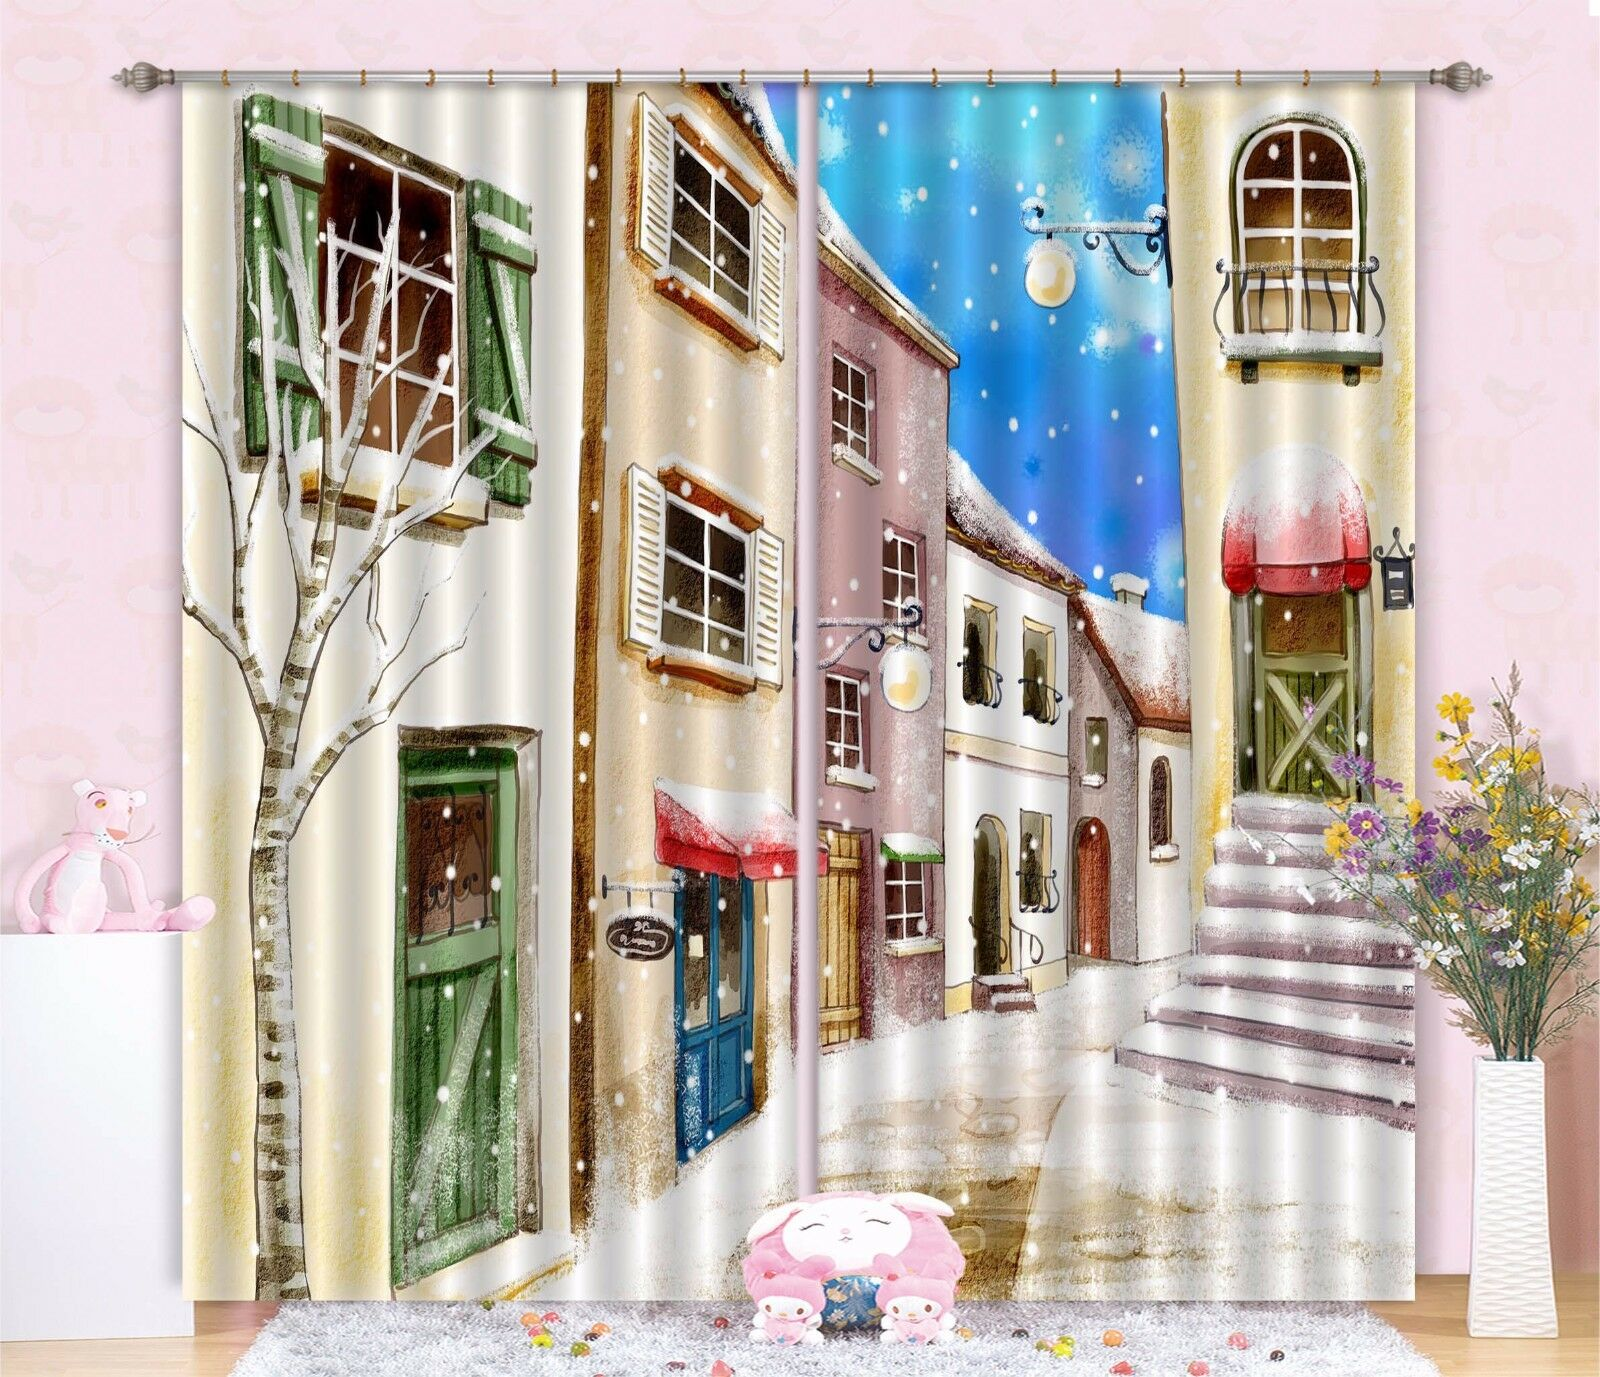 3D nieve Street 436 Cortinas de impresión de Cortina Blockout Foto Tela Cortinas Ventana Reino Unido